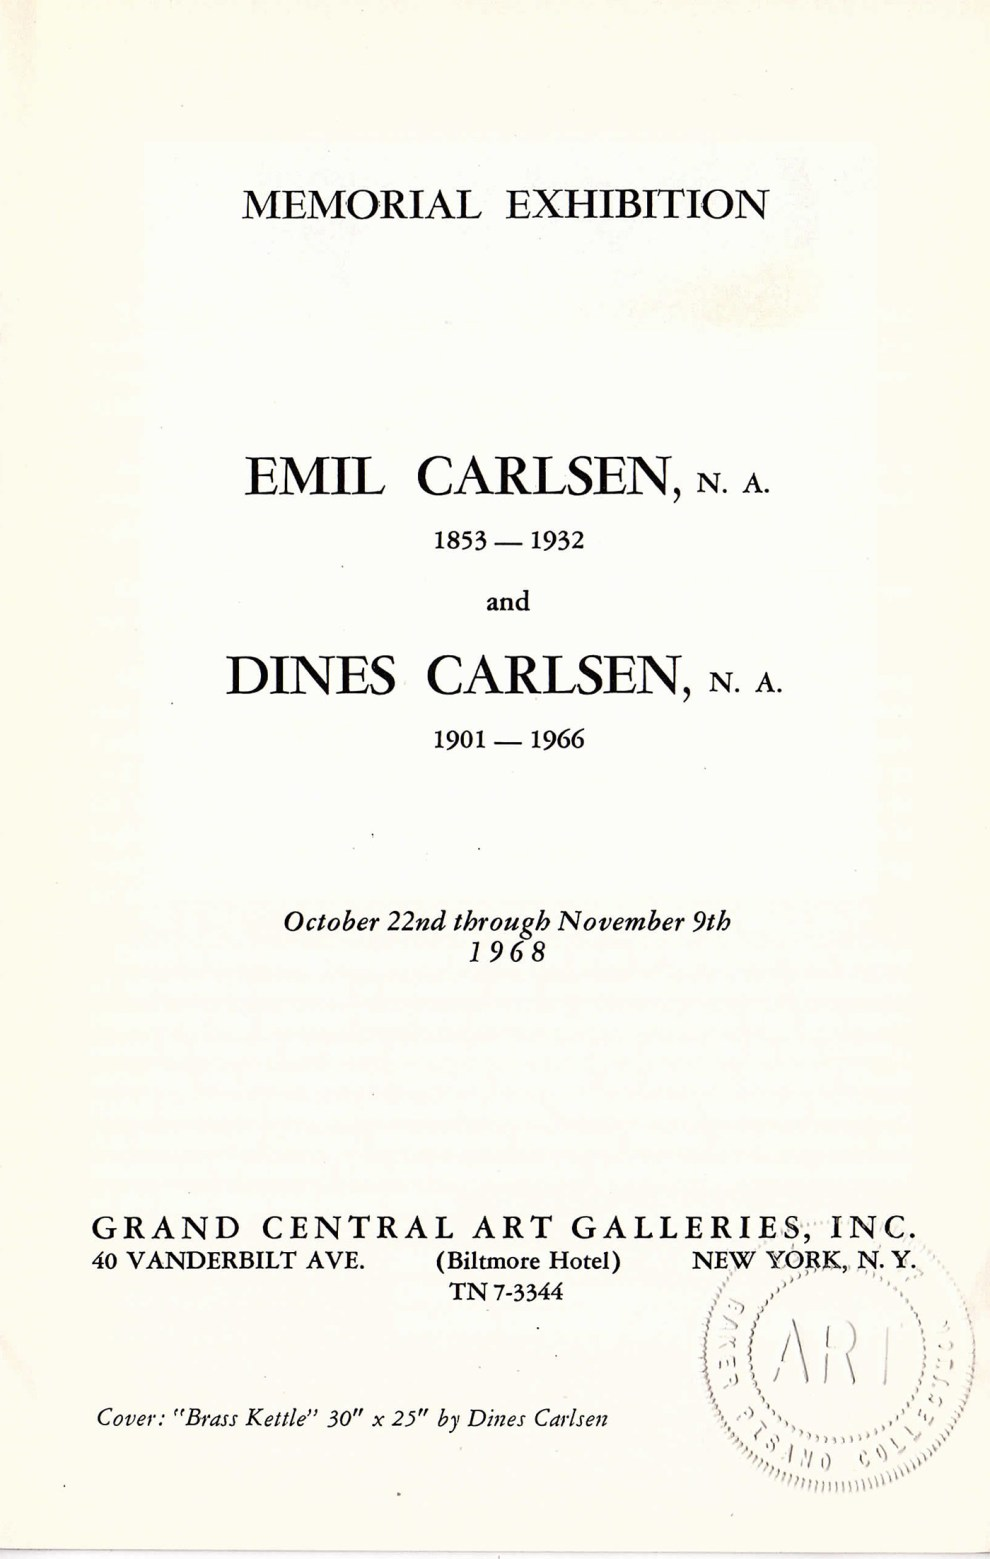 "1968 The Grand Central Art Gallery, New York, NY, ""Memorial Exhibition Emil Carlsen & Dines Carlsen"" October 22-November 9"